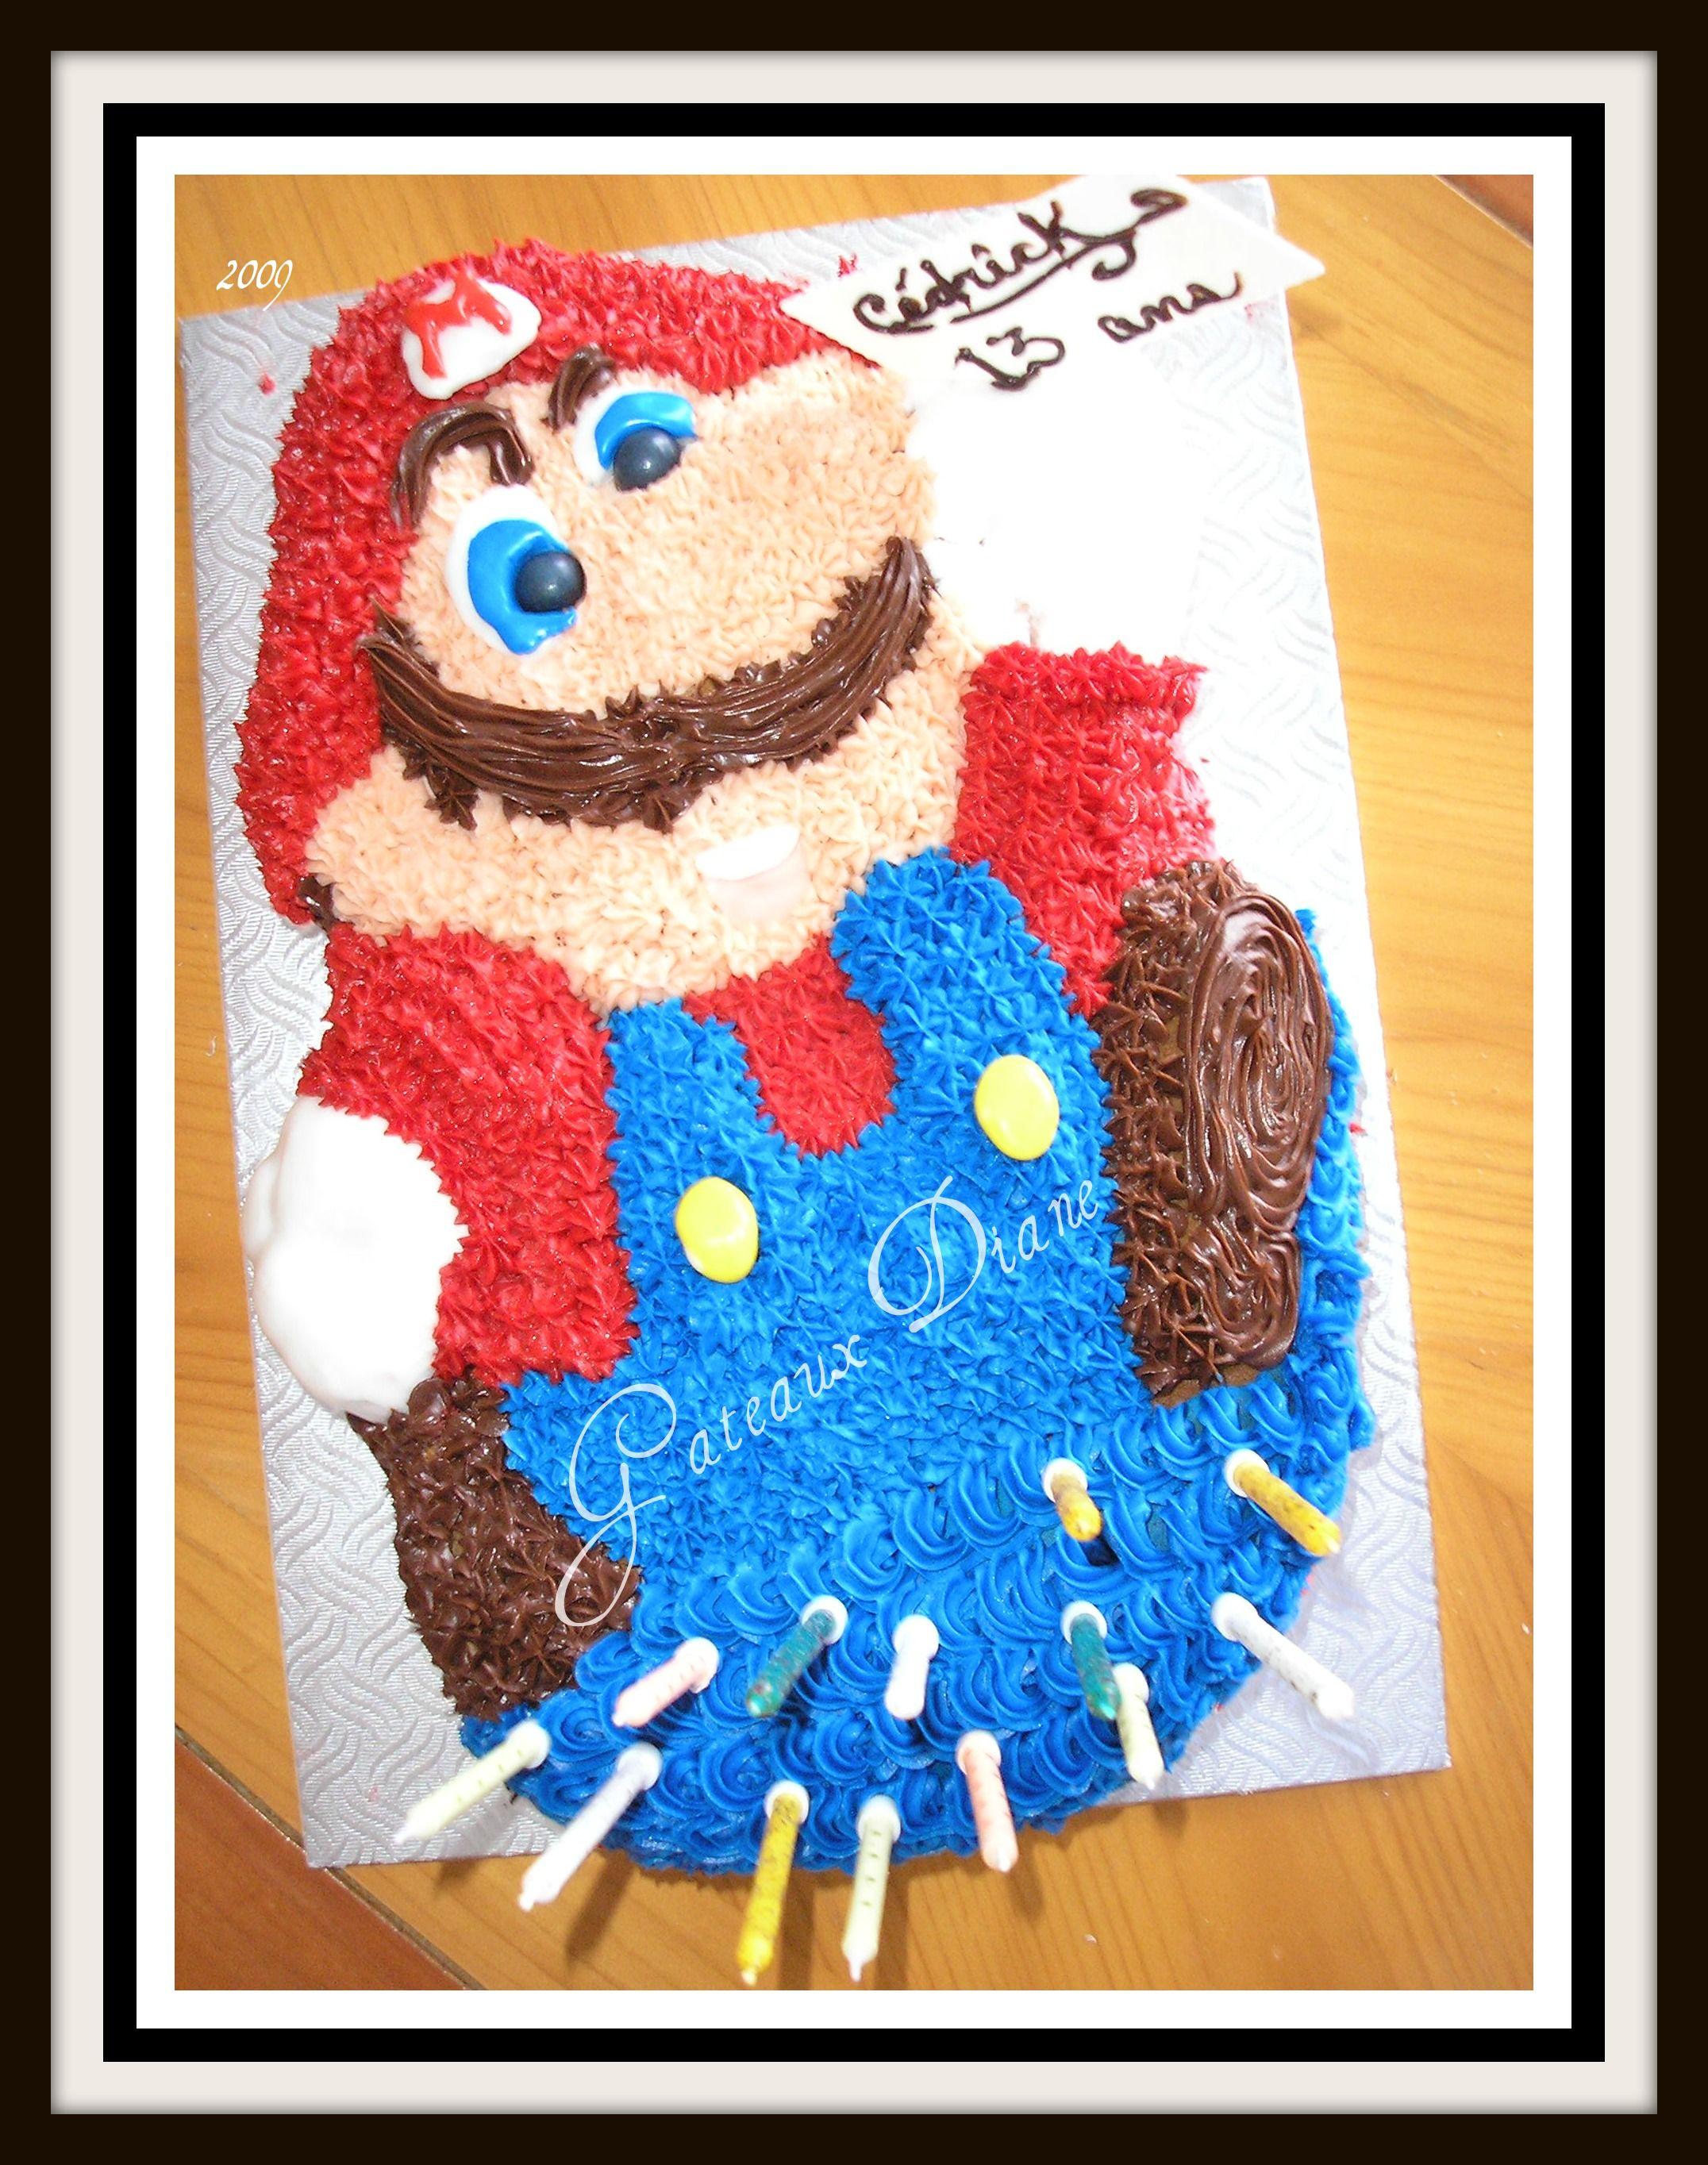 Mario Bross (Cédrick 2009)